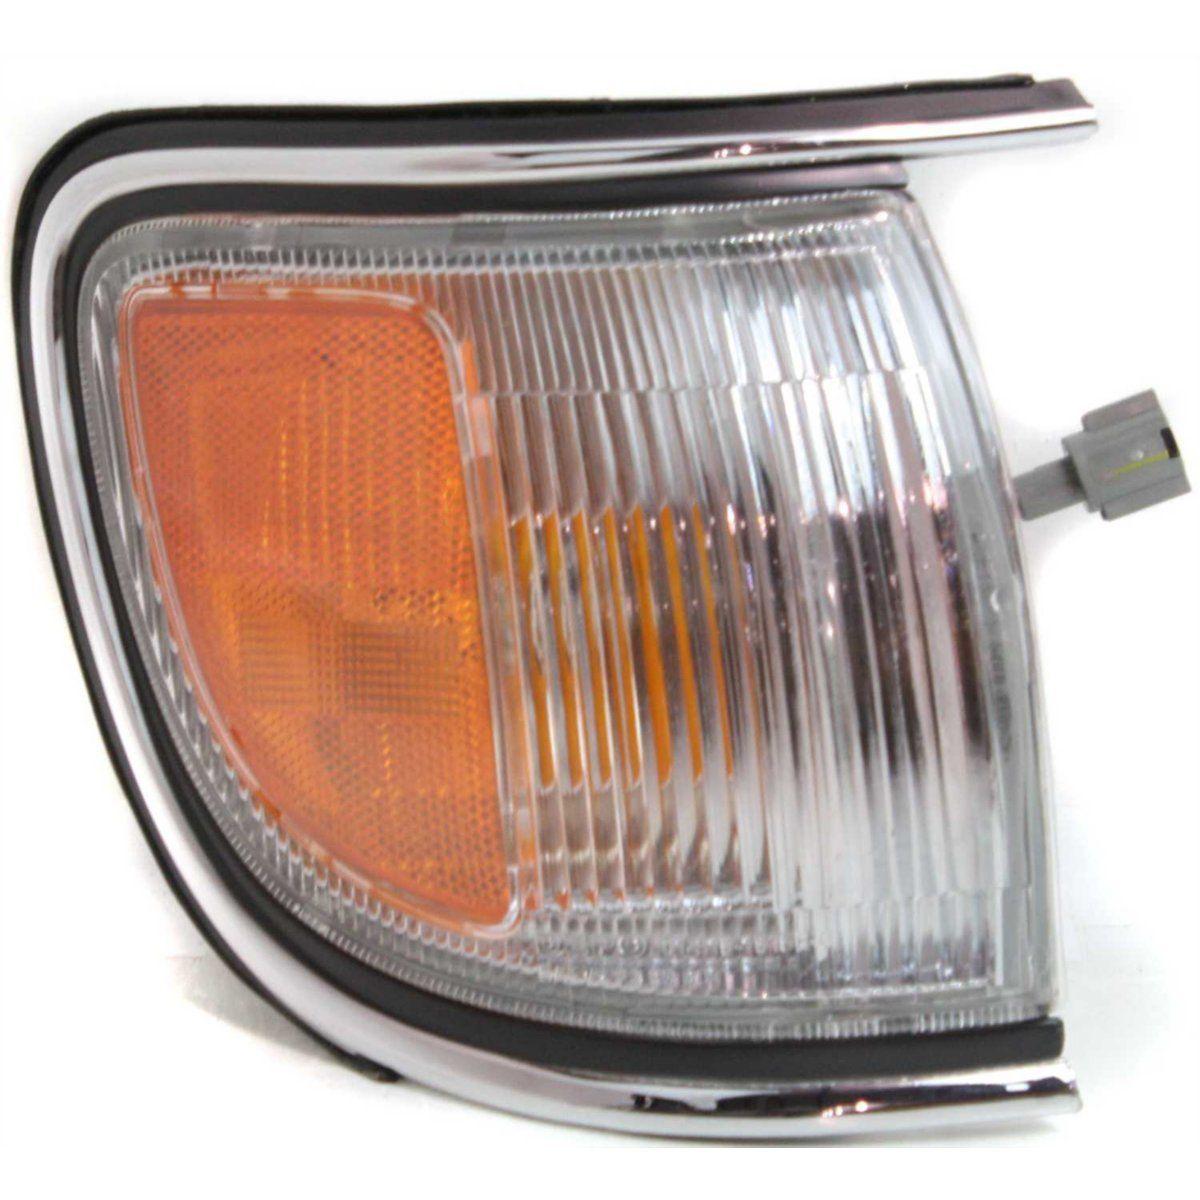 USコーナーライト Corner Light For 96-98 Nissan Pathfinder w/ chrome trim RH Incandescent w/ Bulb コーナーライト96-98日産パスファインダークロムトリム付きRH白熱電球付き